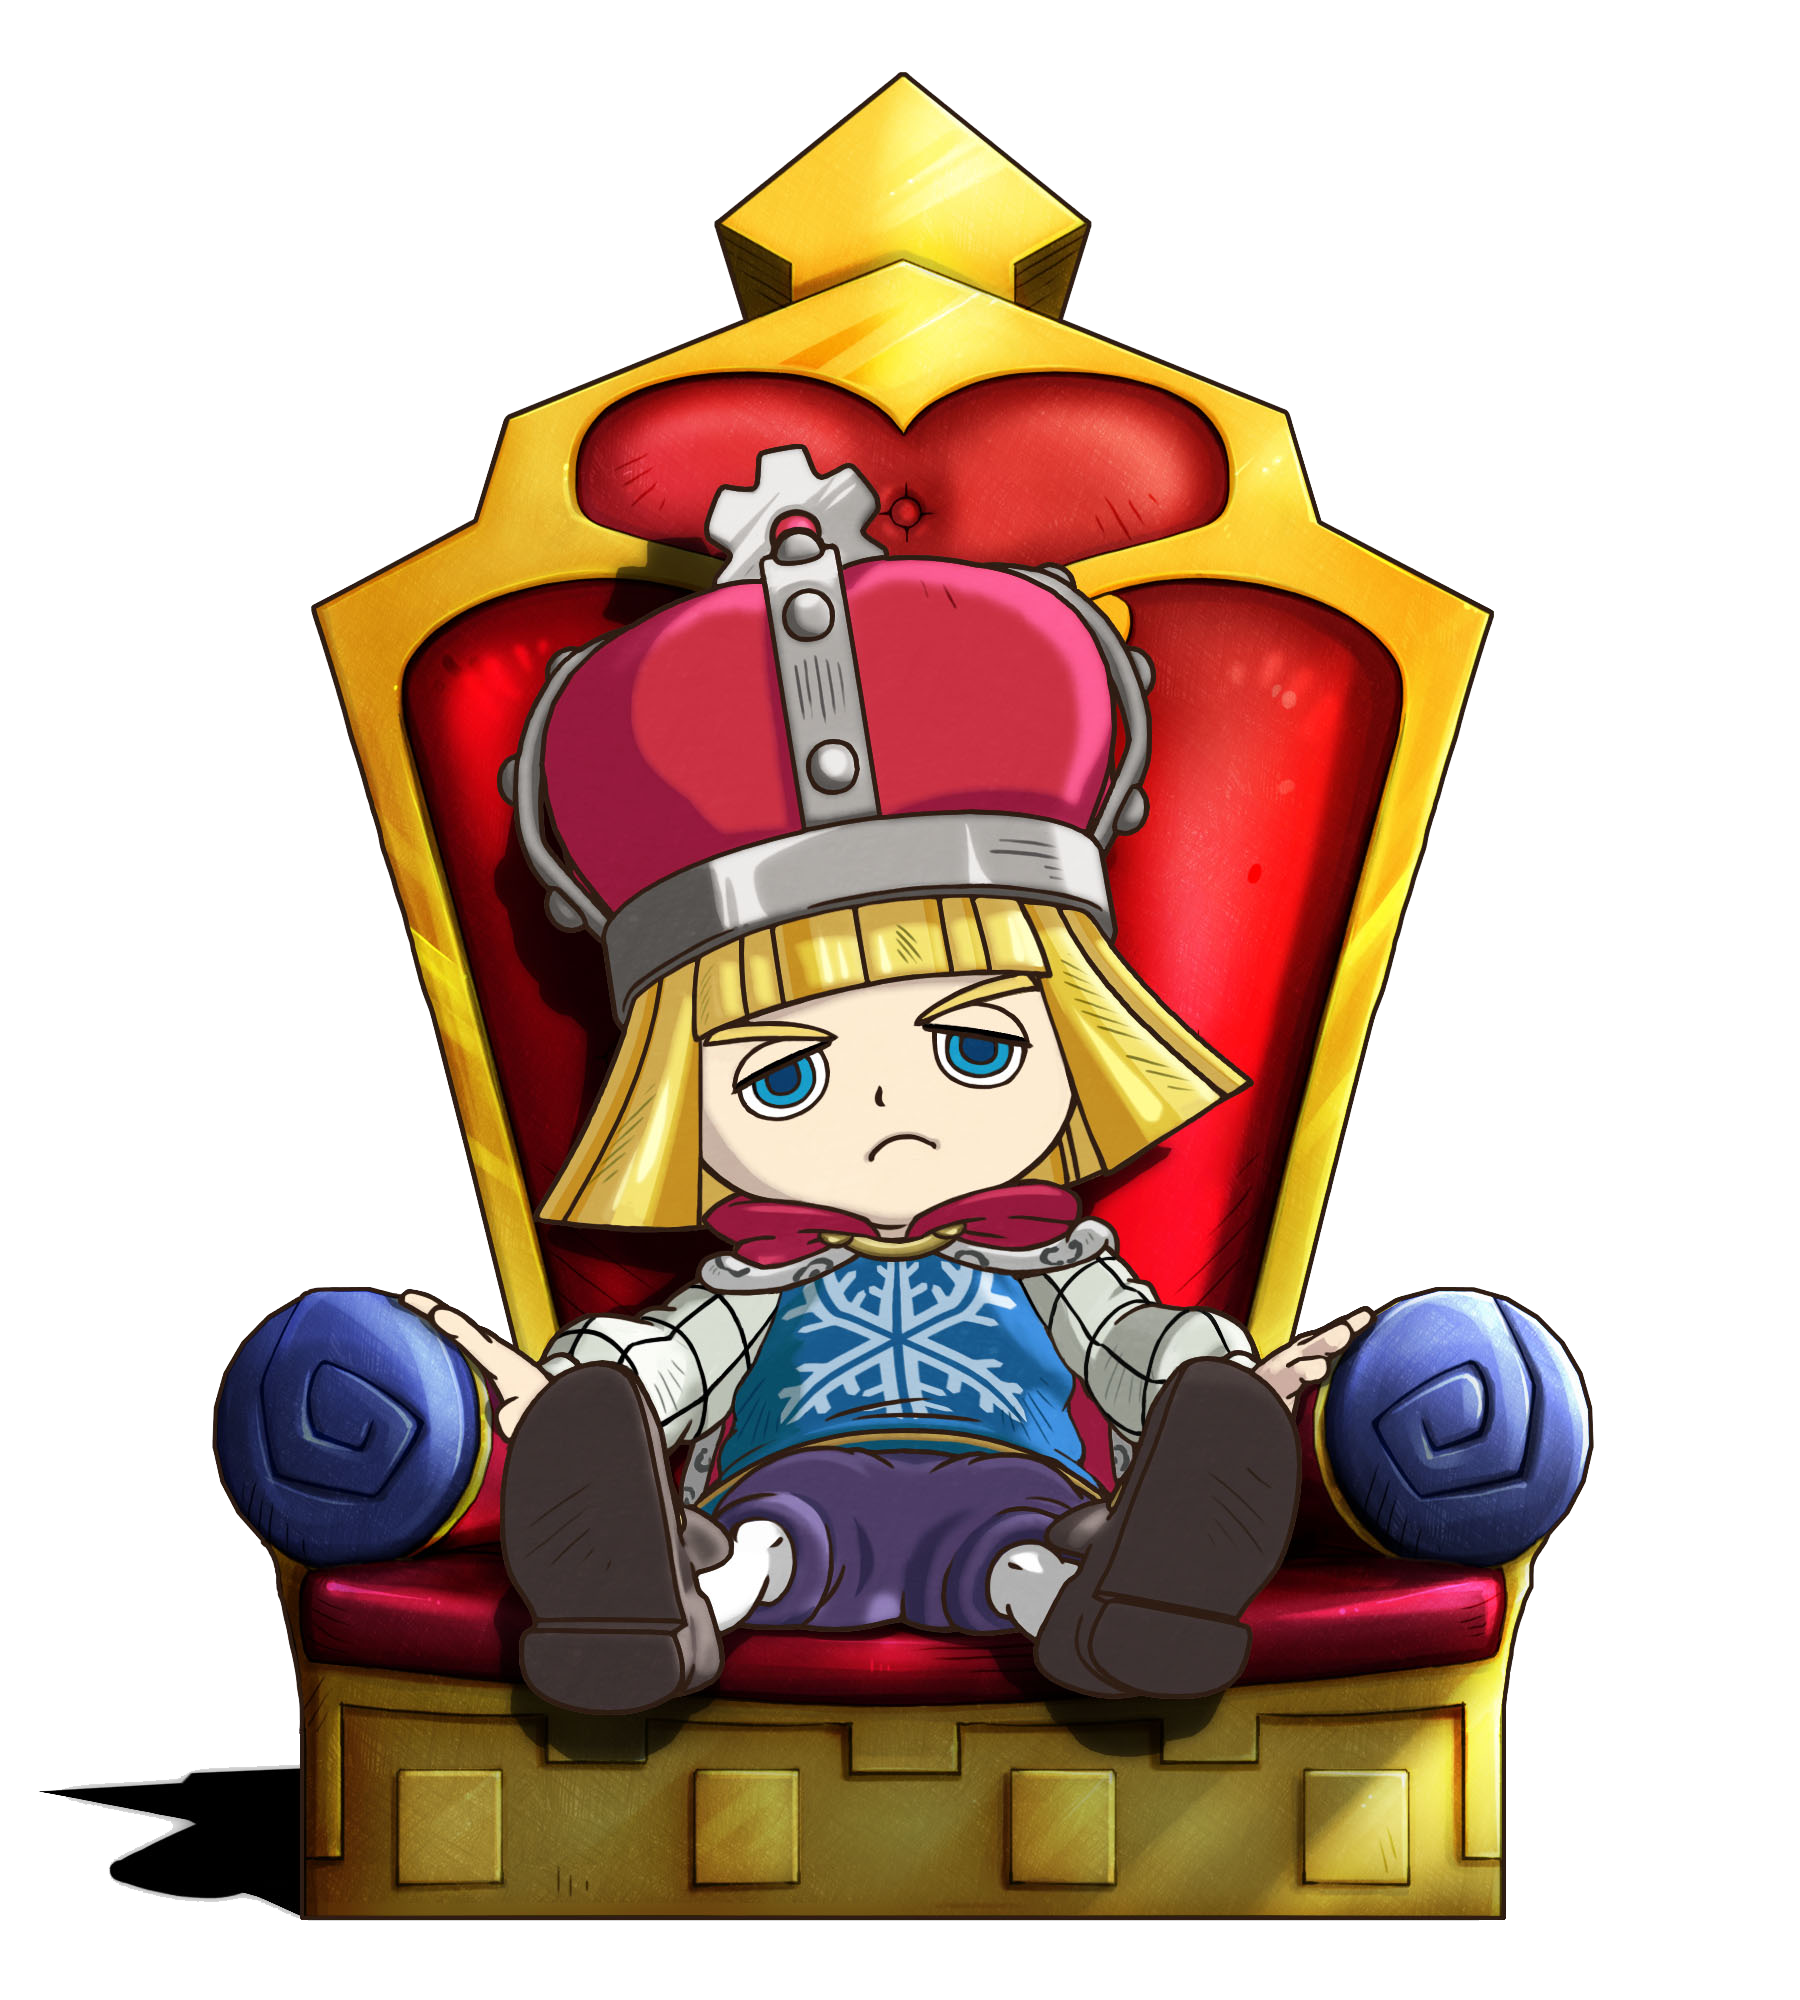 King Erik Stone